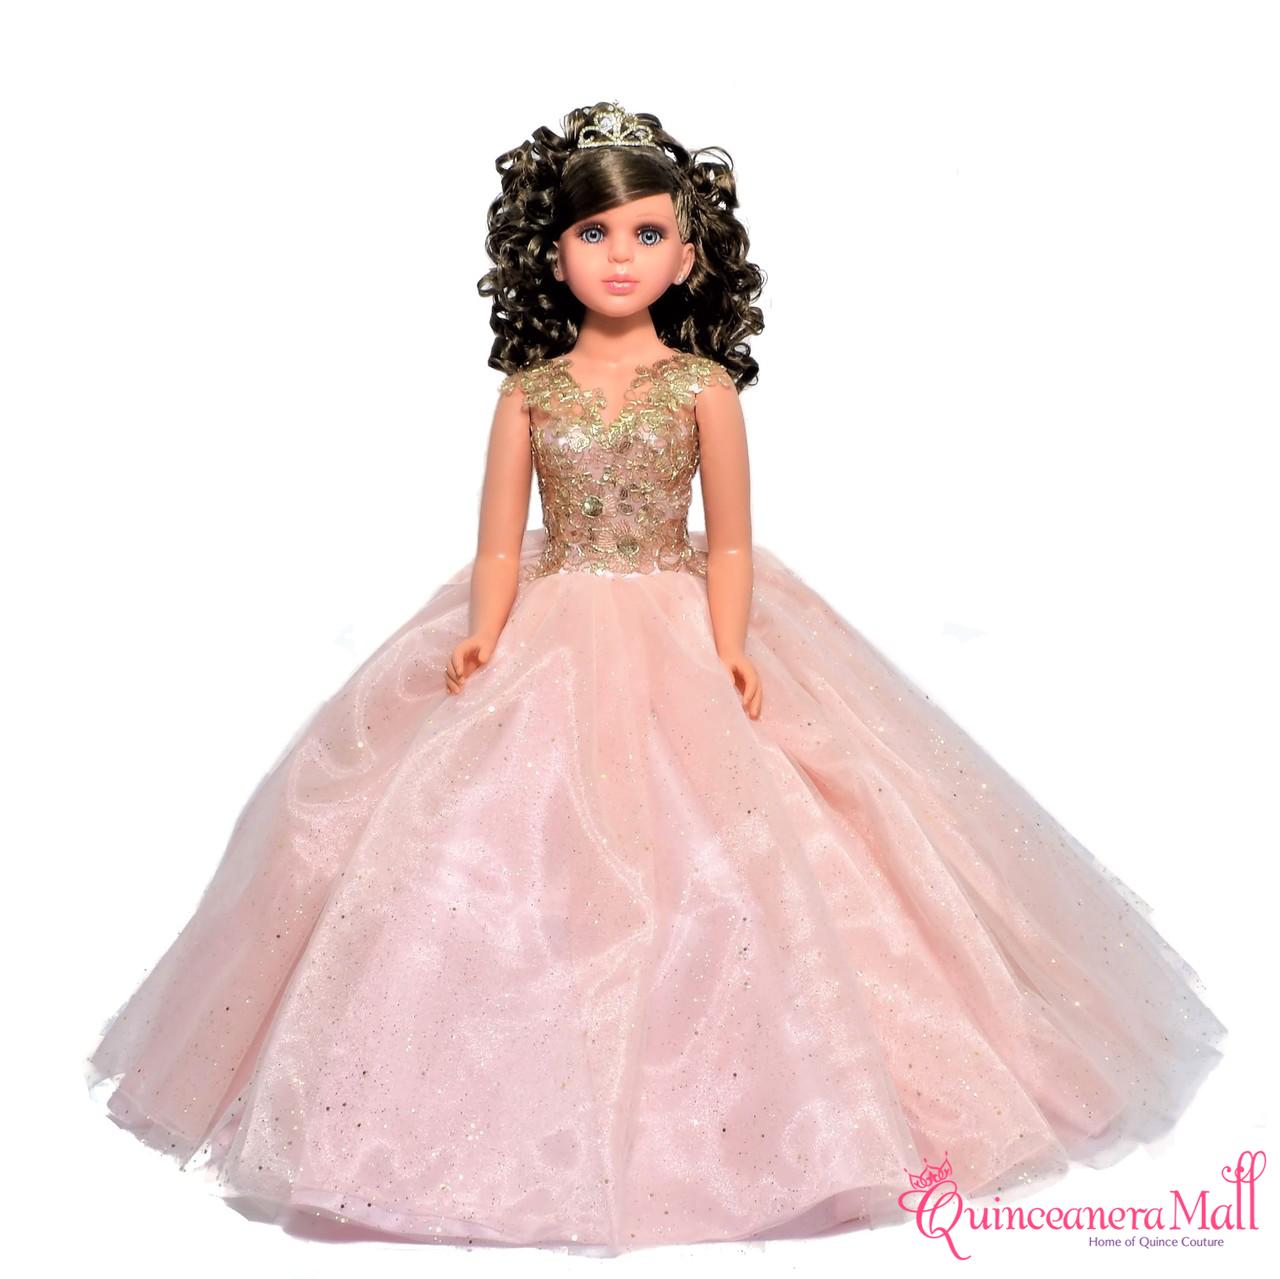 7ee46816141 quinceanera and sweet sixteen dolls